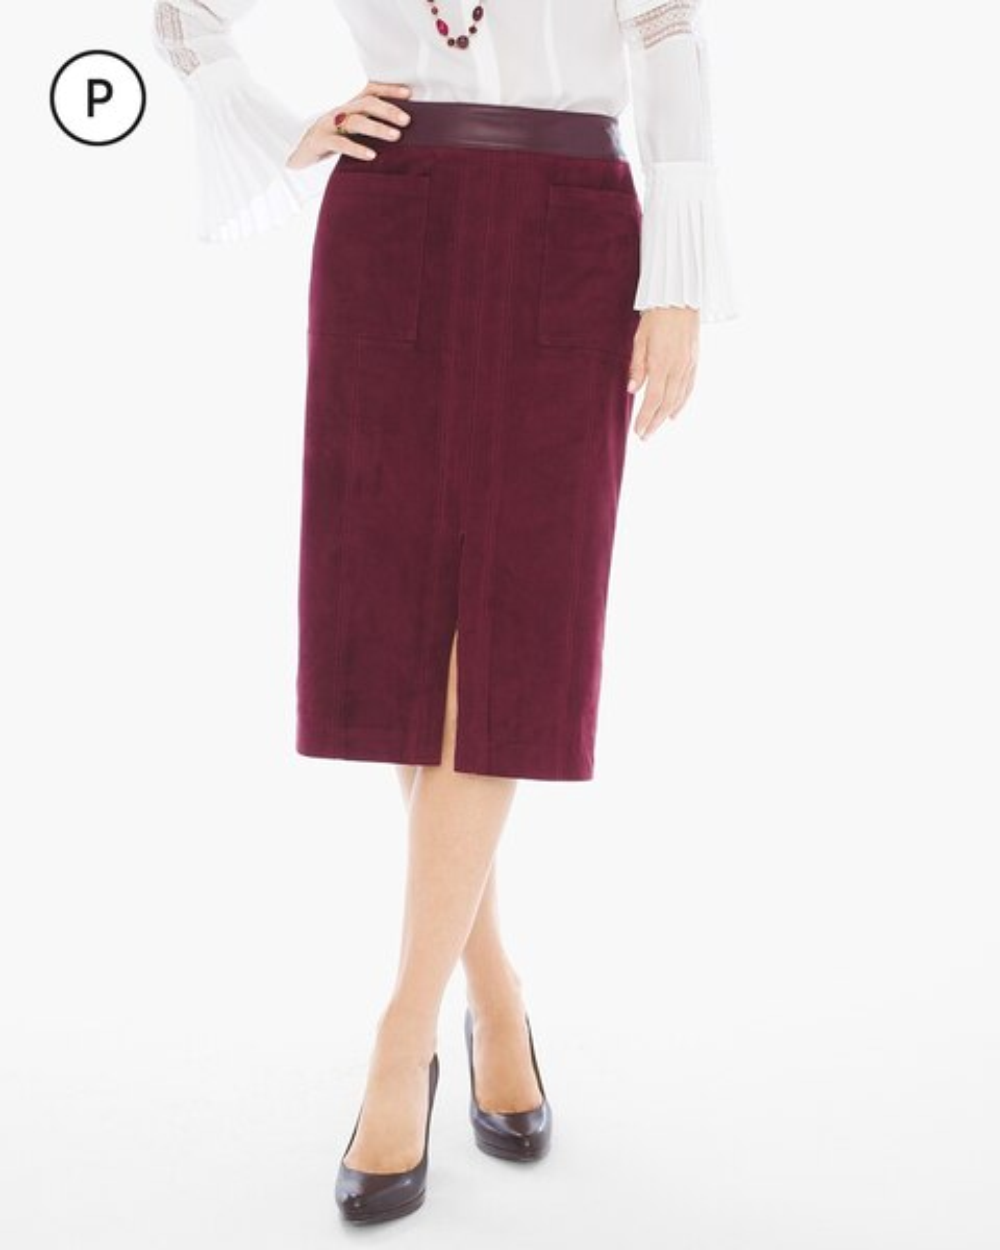 Petite Faux-Suede Midi Skirt - Chicos